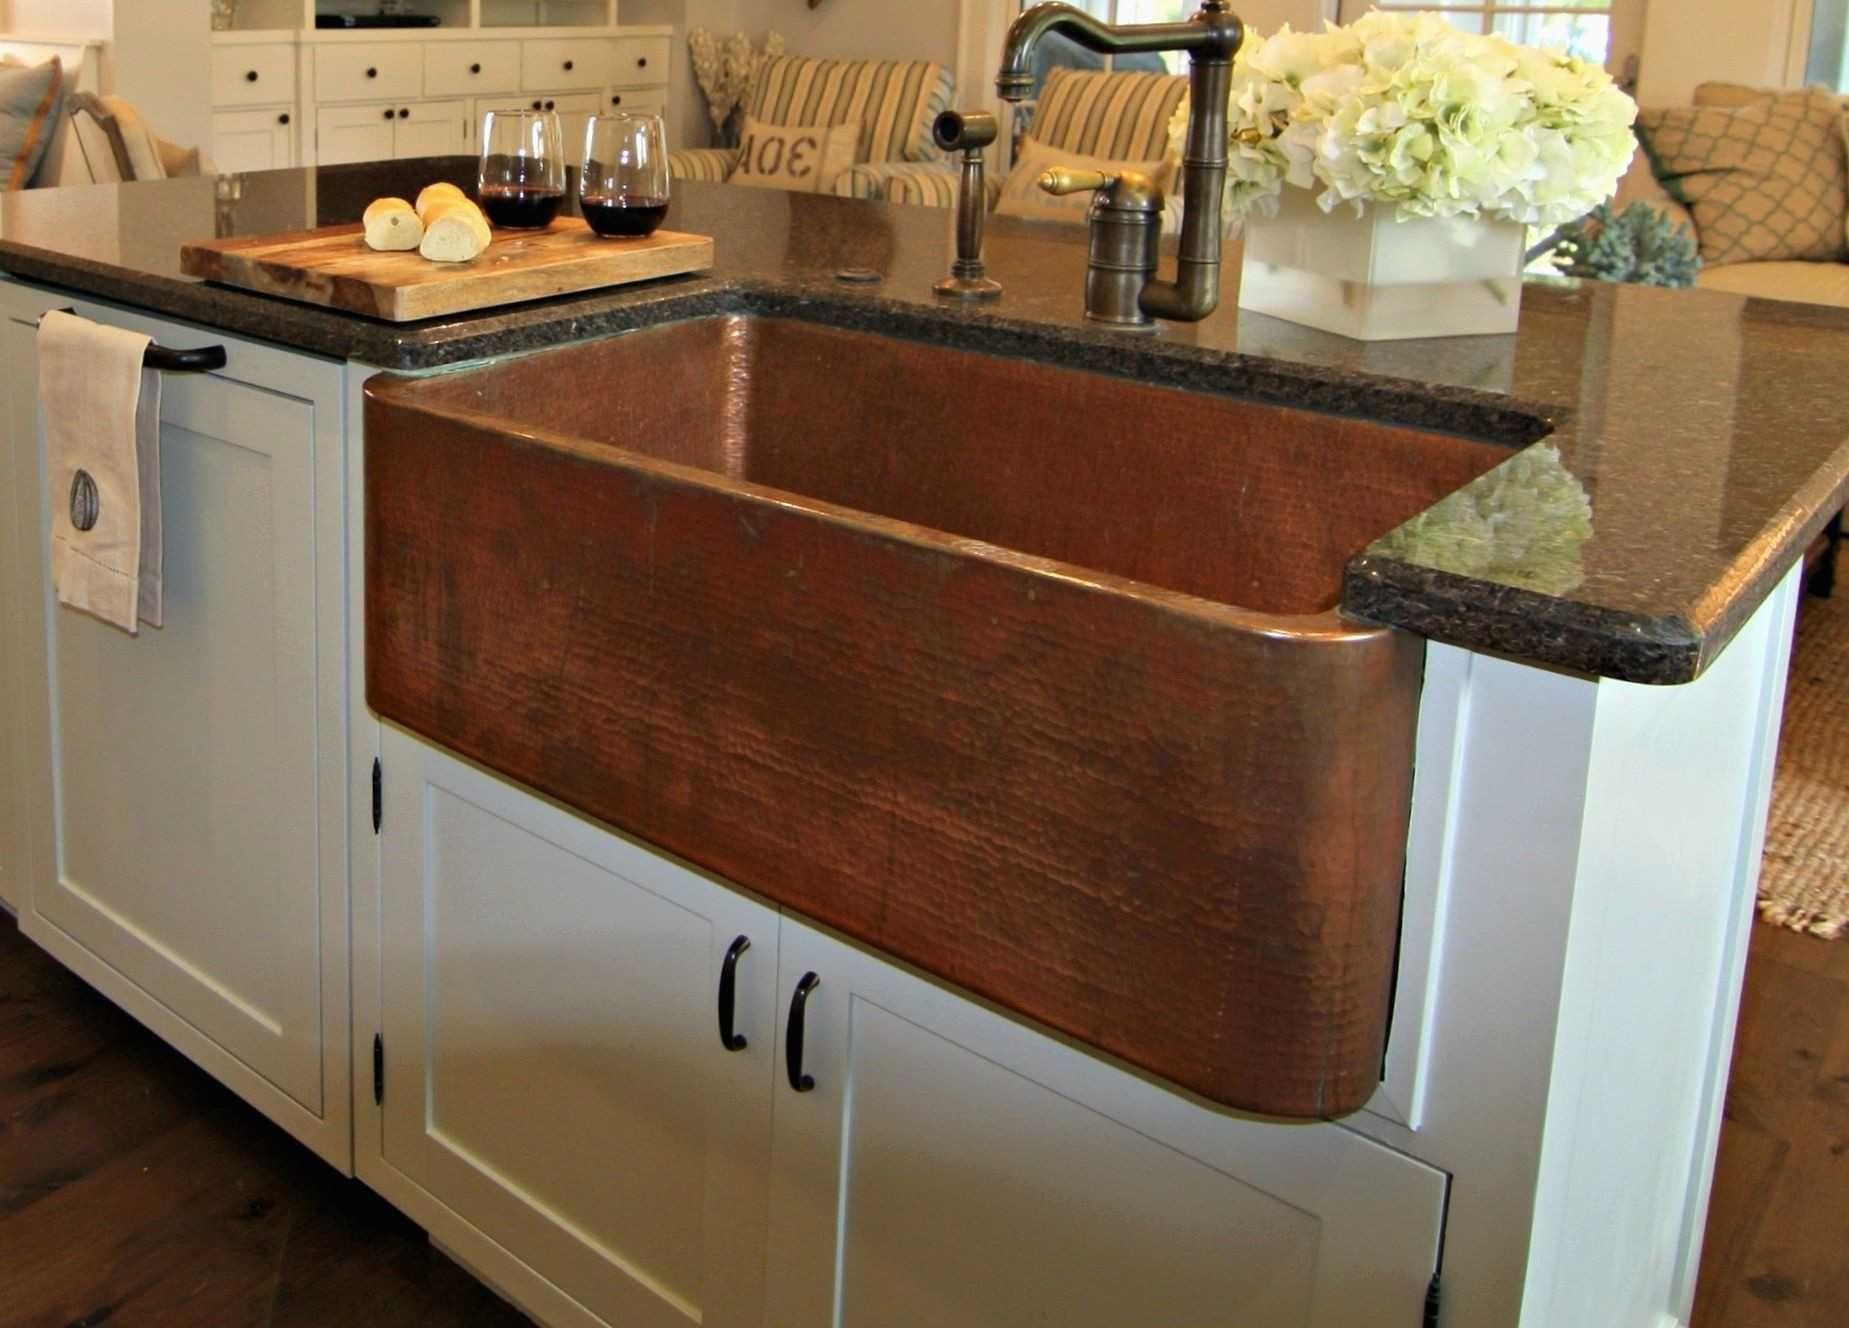 Kitchen Ranch Style Farmhouse Sink Awesome Kitchen Ranch Style Farmhouse Sink 50 New Ins Copper Farmhouse Sinks Kitchen Sink Remodel Farmhouse Sink Kitchen